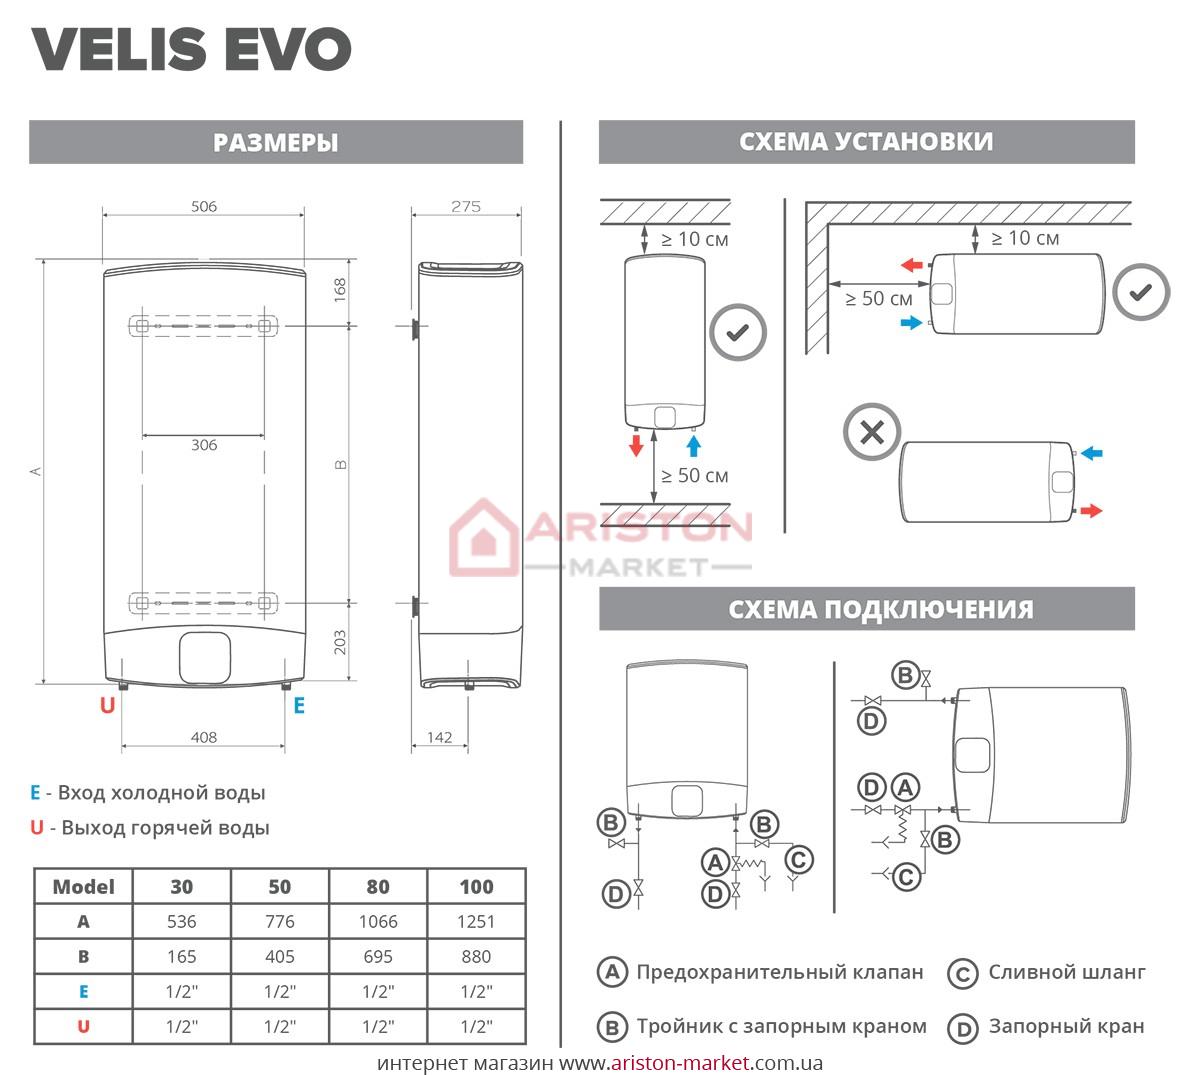 Ariston ABS Velis Evo Power 80 D схема, габариты, чертеж